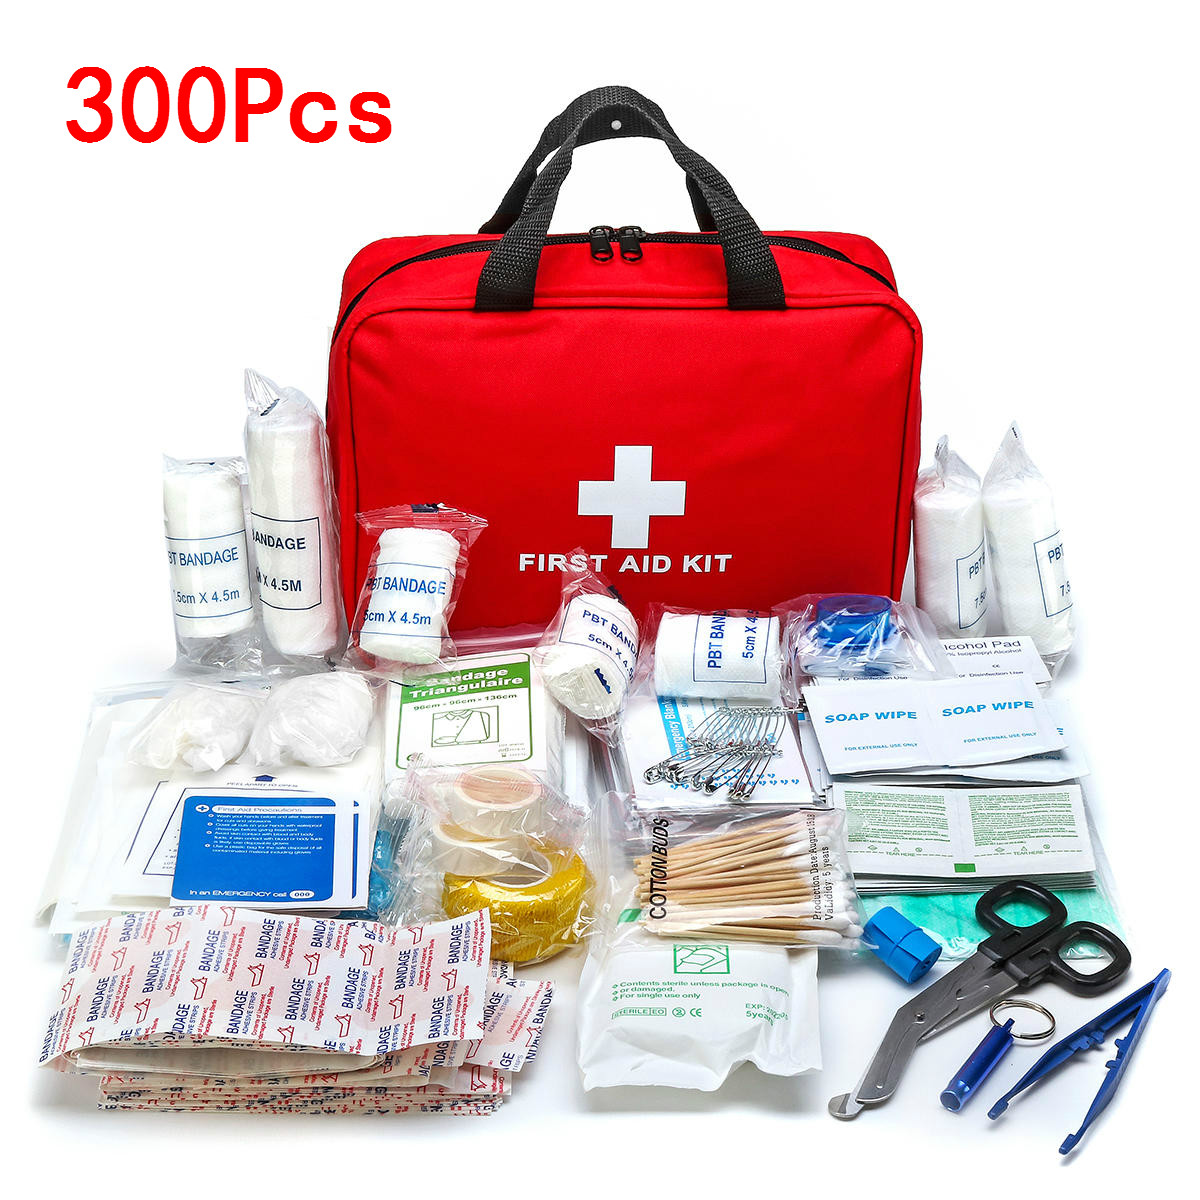 Portable 16-300Pcs Emergency Survival Set First Aid Kit for Medicines Outdoor Camping Hiking Medical Bag Emergency Handbag(China)